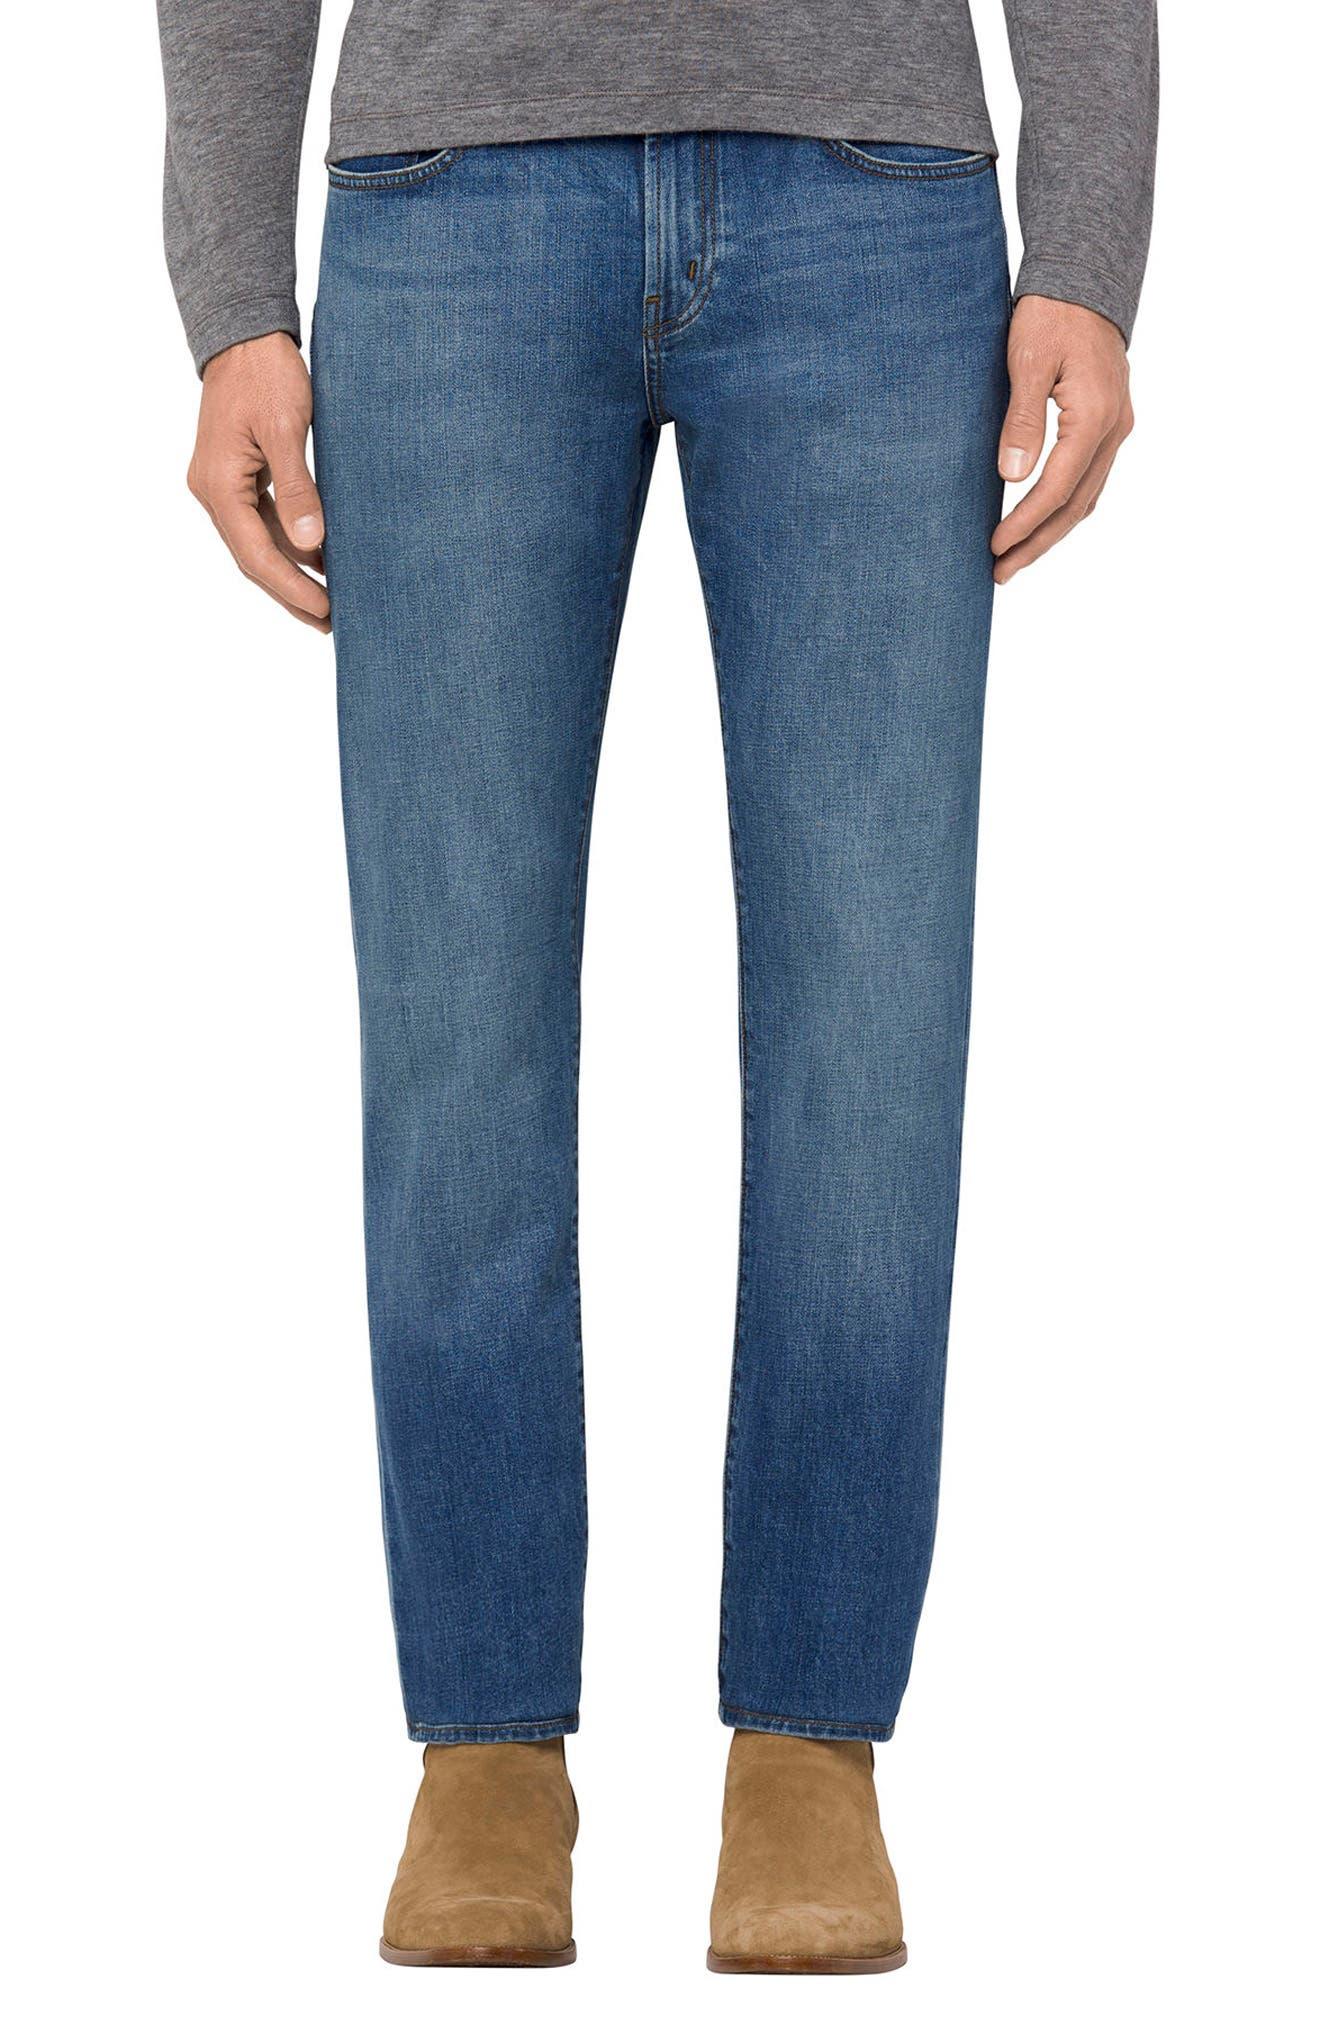 Main Image - J Brand Tyler Slim Fit Jeans (Hammerhead)